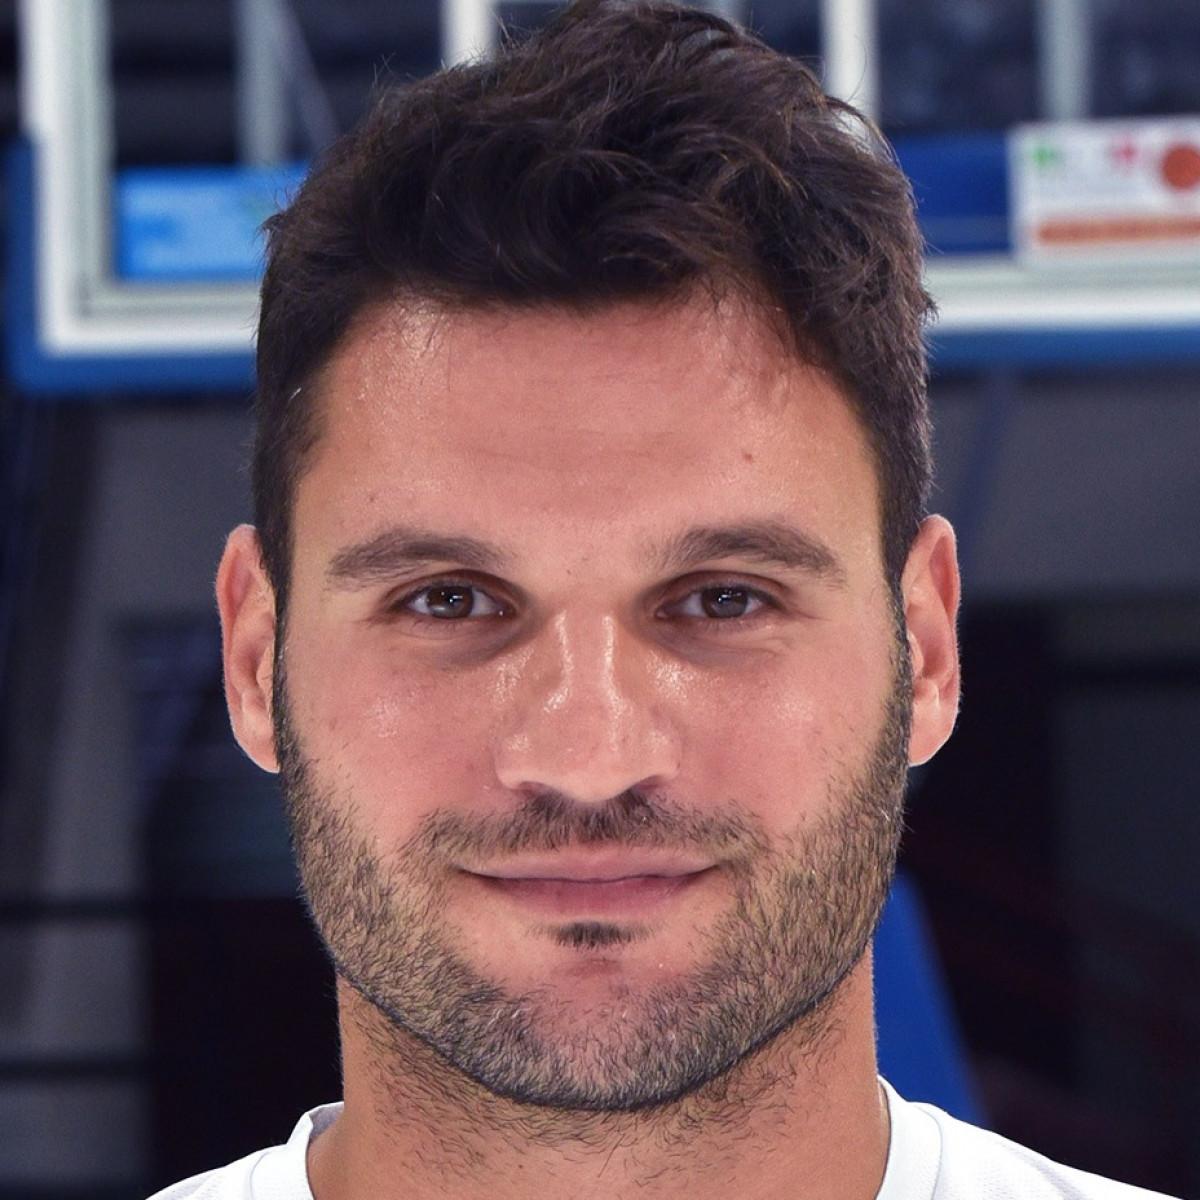 Marco Giuri